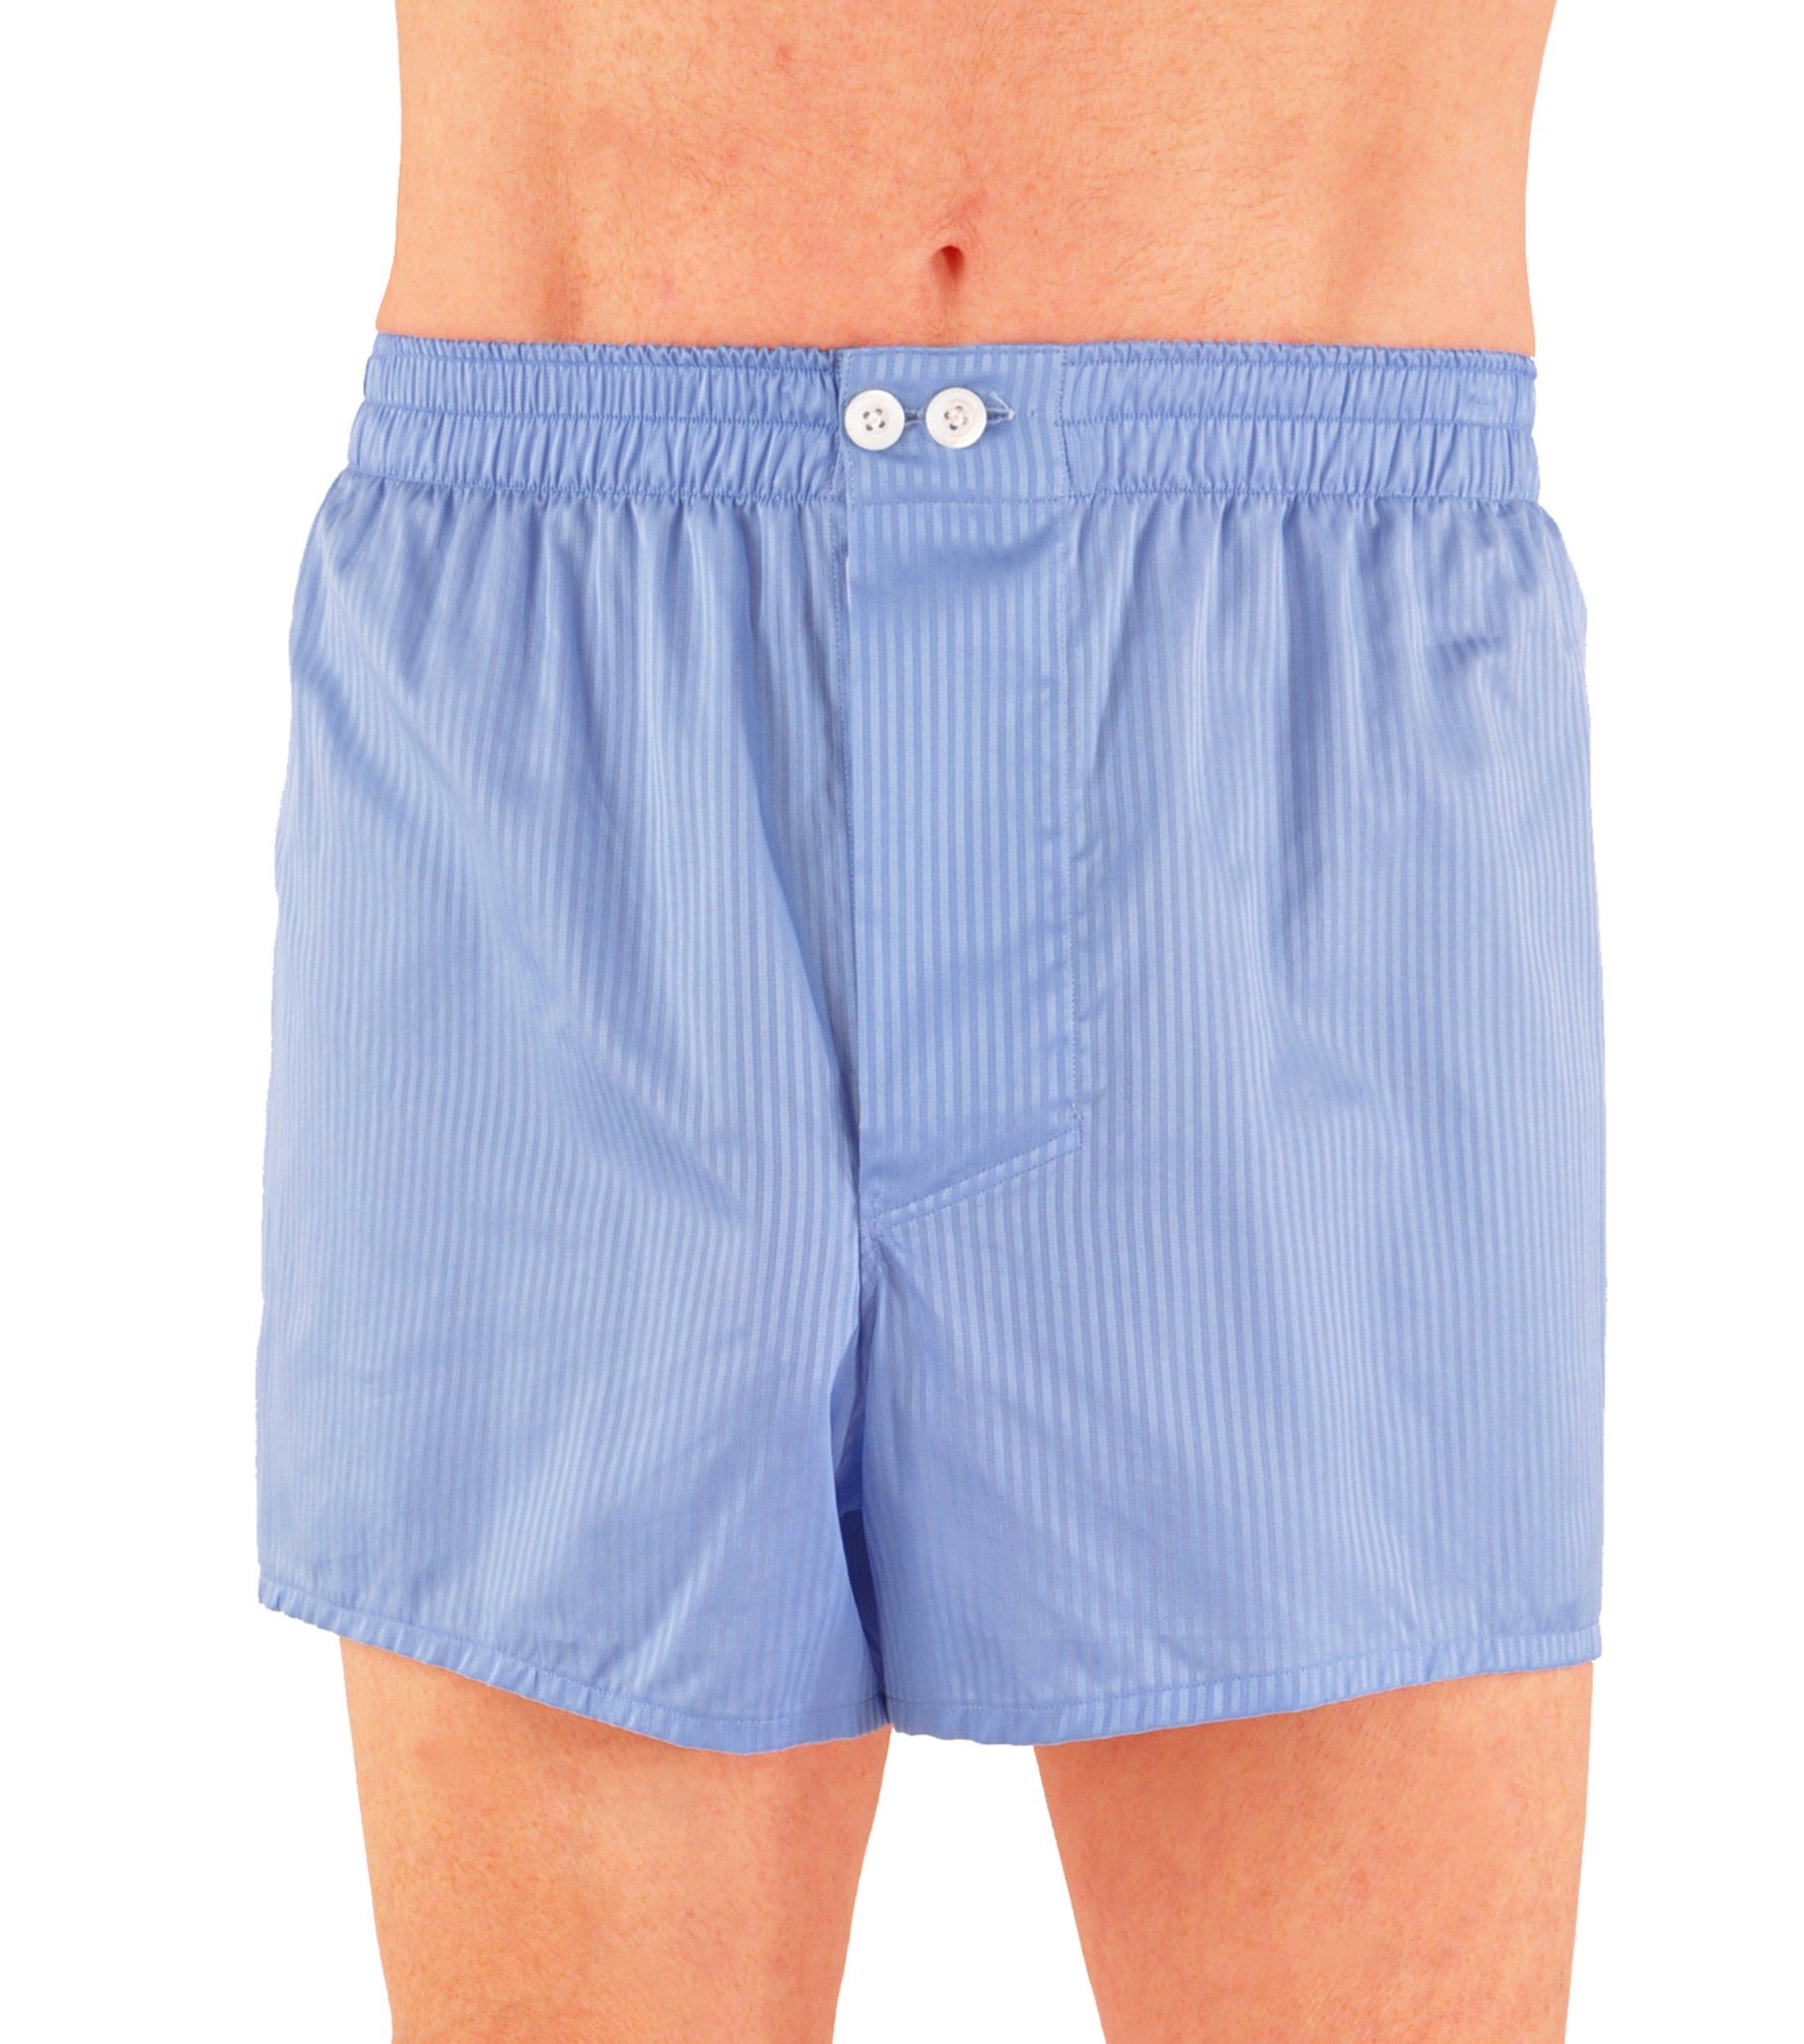 World's Finest Woven Boxer Shorts - 3 Pairs Medium/Blue by Kabbaz-Kelly (Image #1)